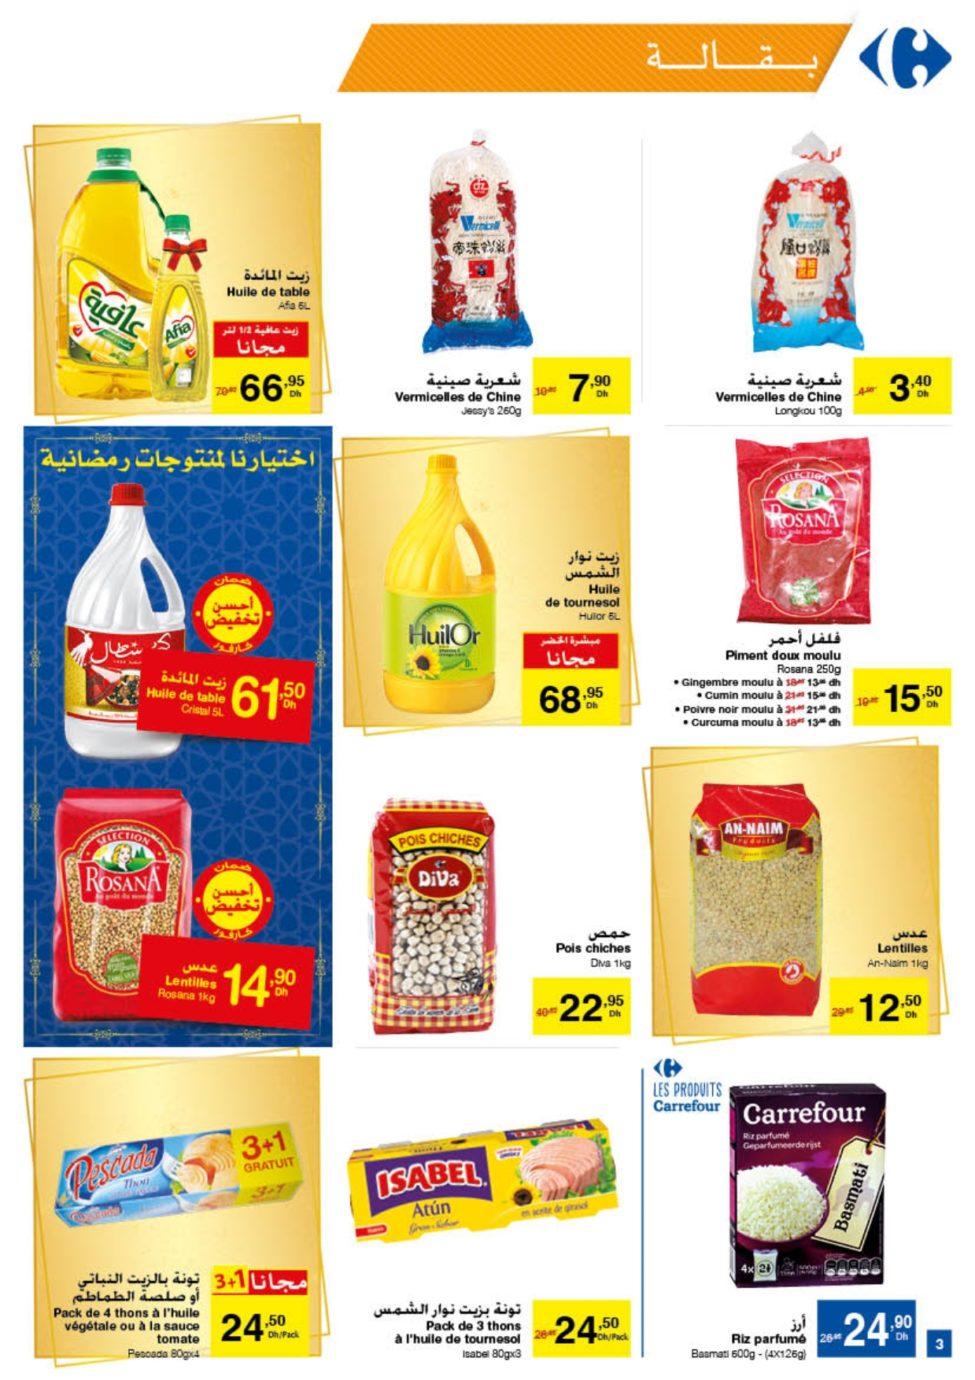 Catalogue Du Au Mai – كريم Maroc Carrefour Solde رمضان 15 Et 2019 1 odxeCB